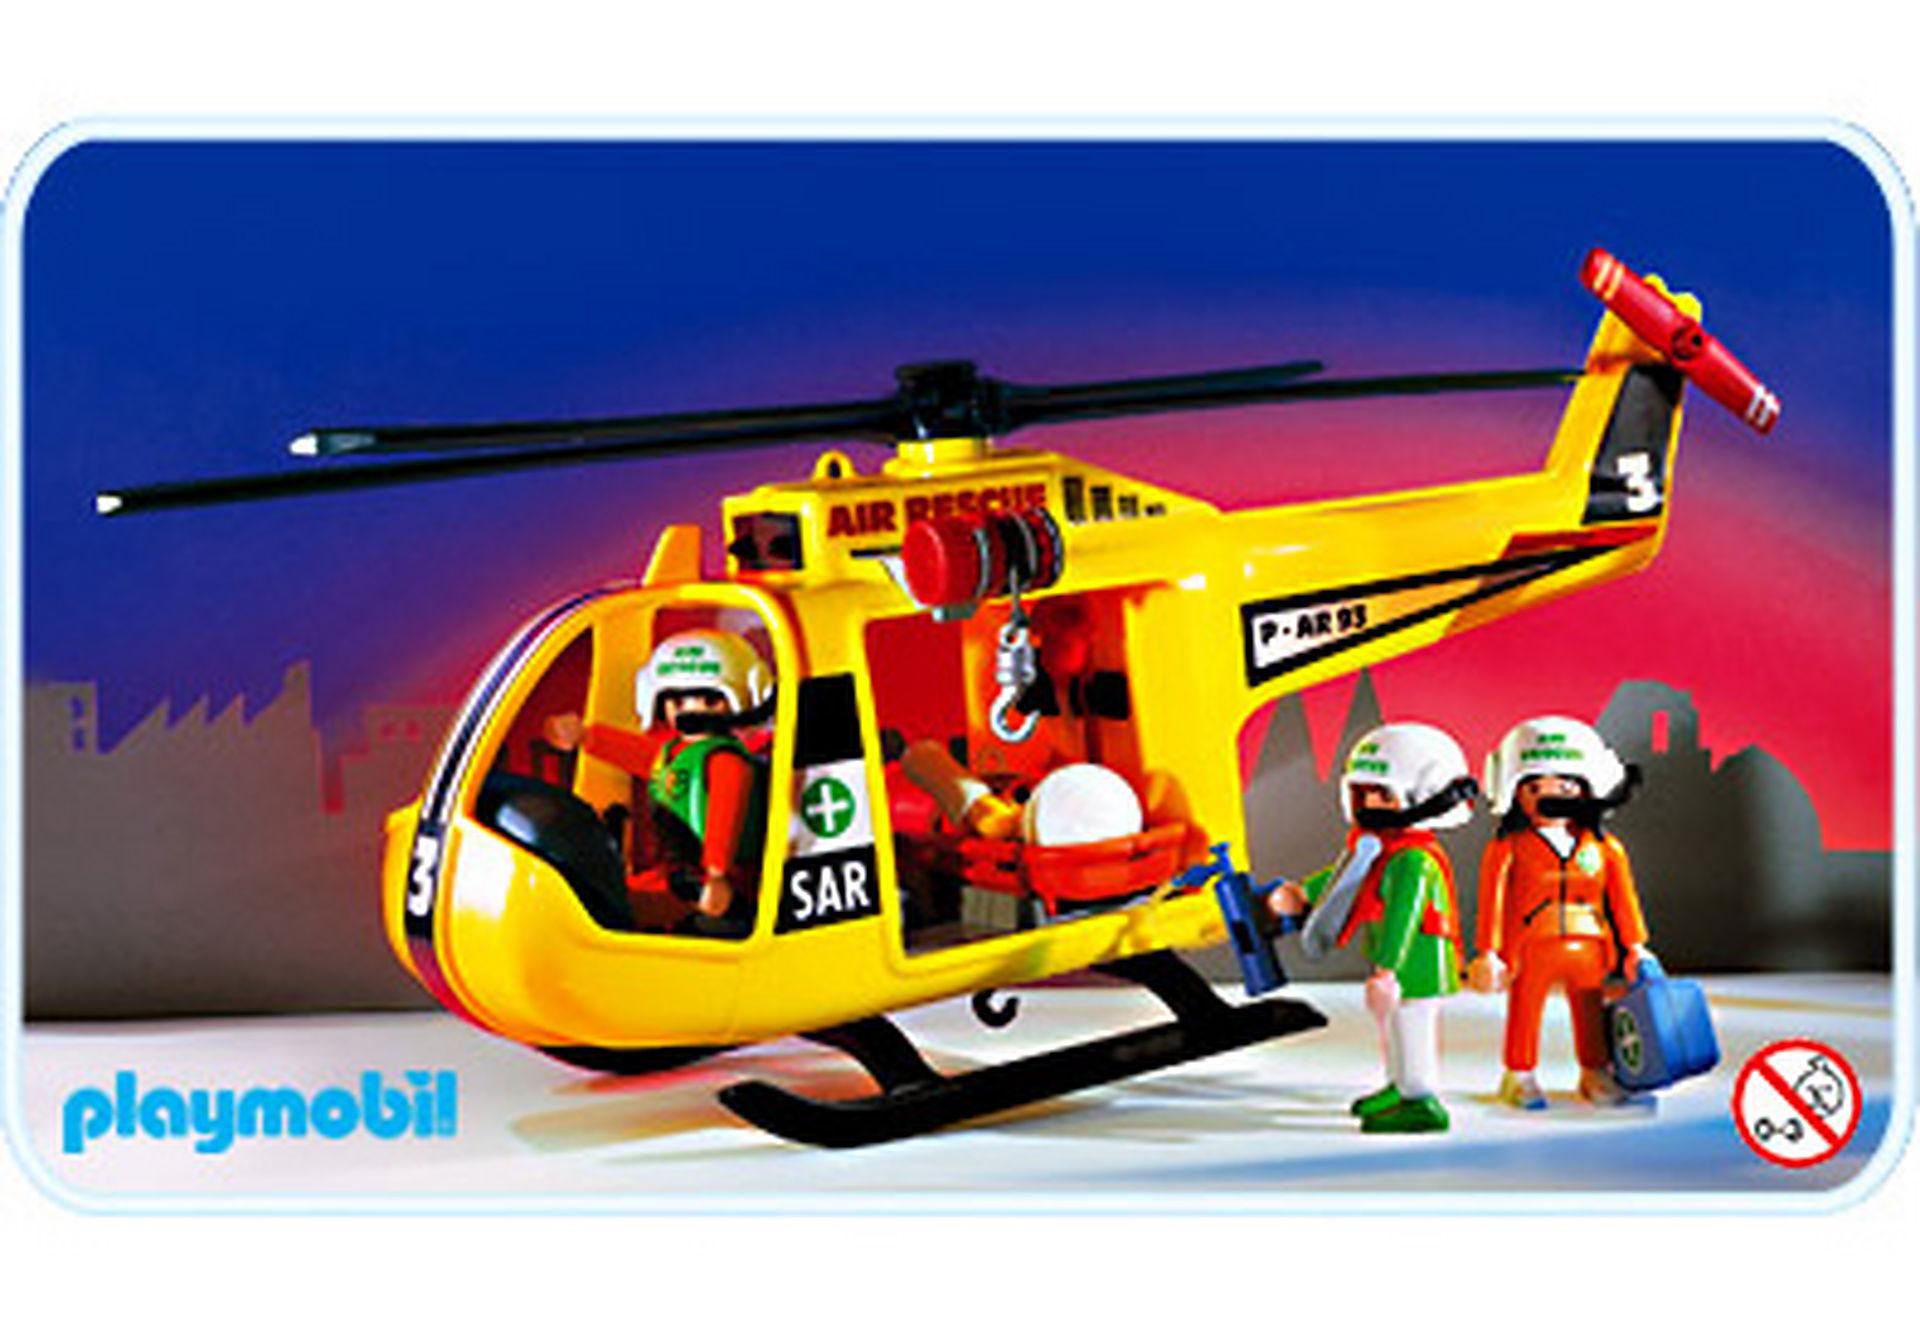 http://media.playmobil.com/i/playmobil/3845-A_product_detail/Rettungshubschrauber